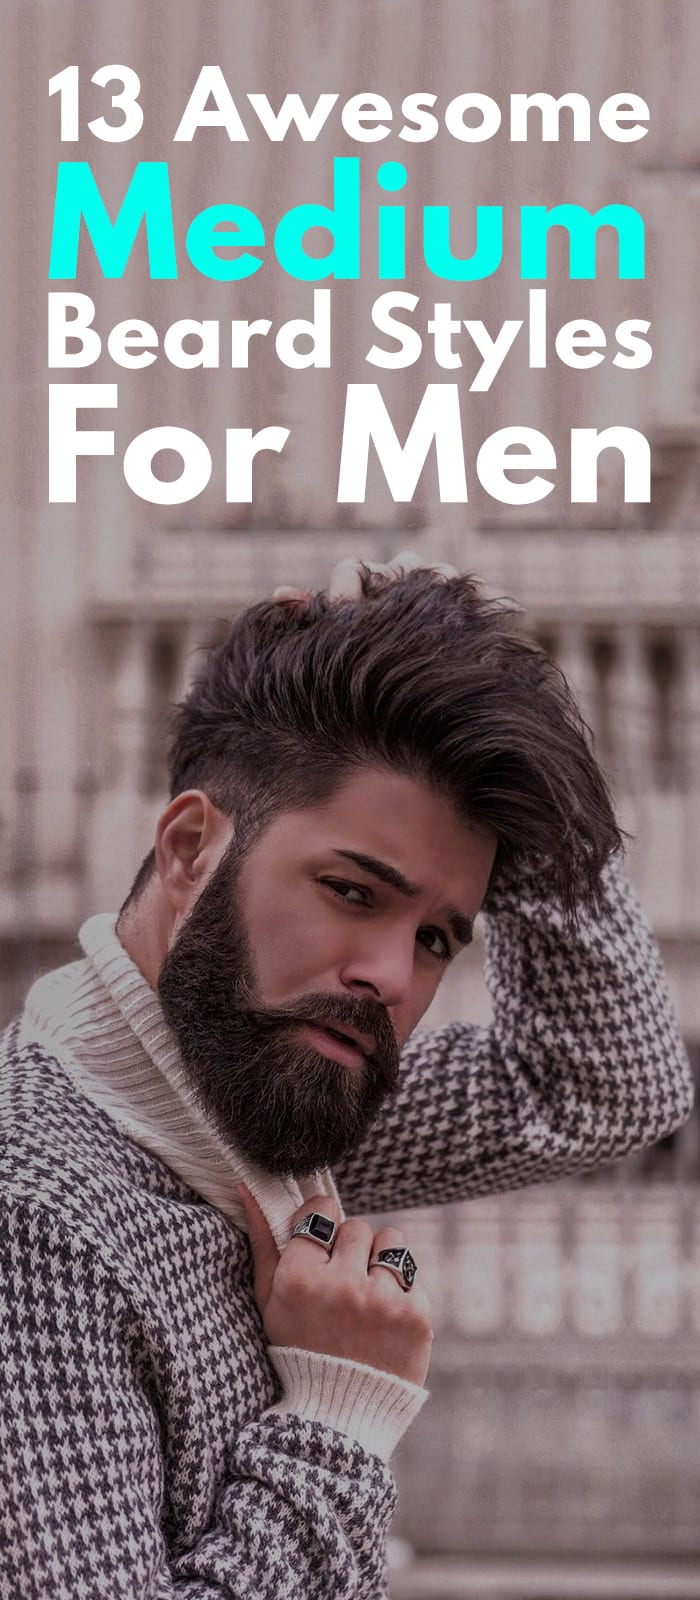 13 Awesome Medium Beard Styles For Men